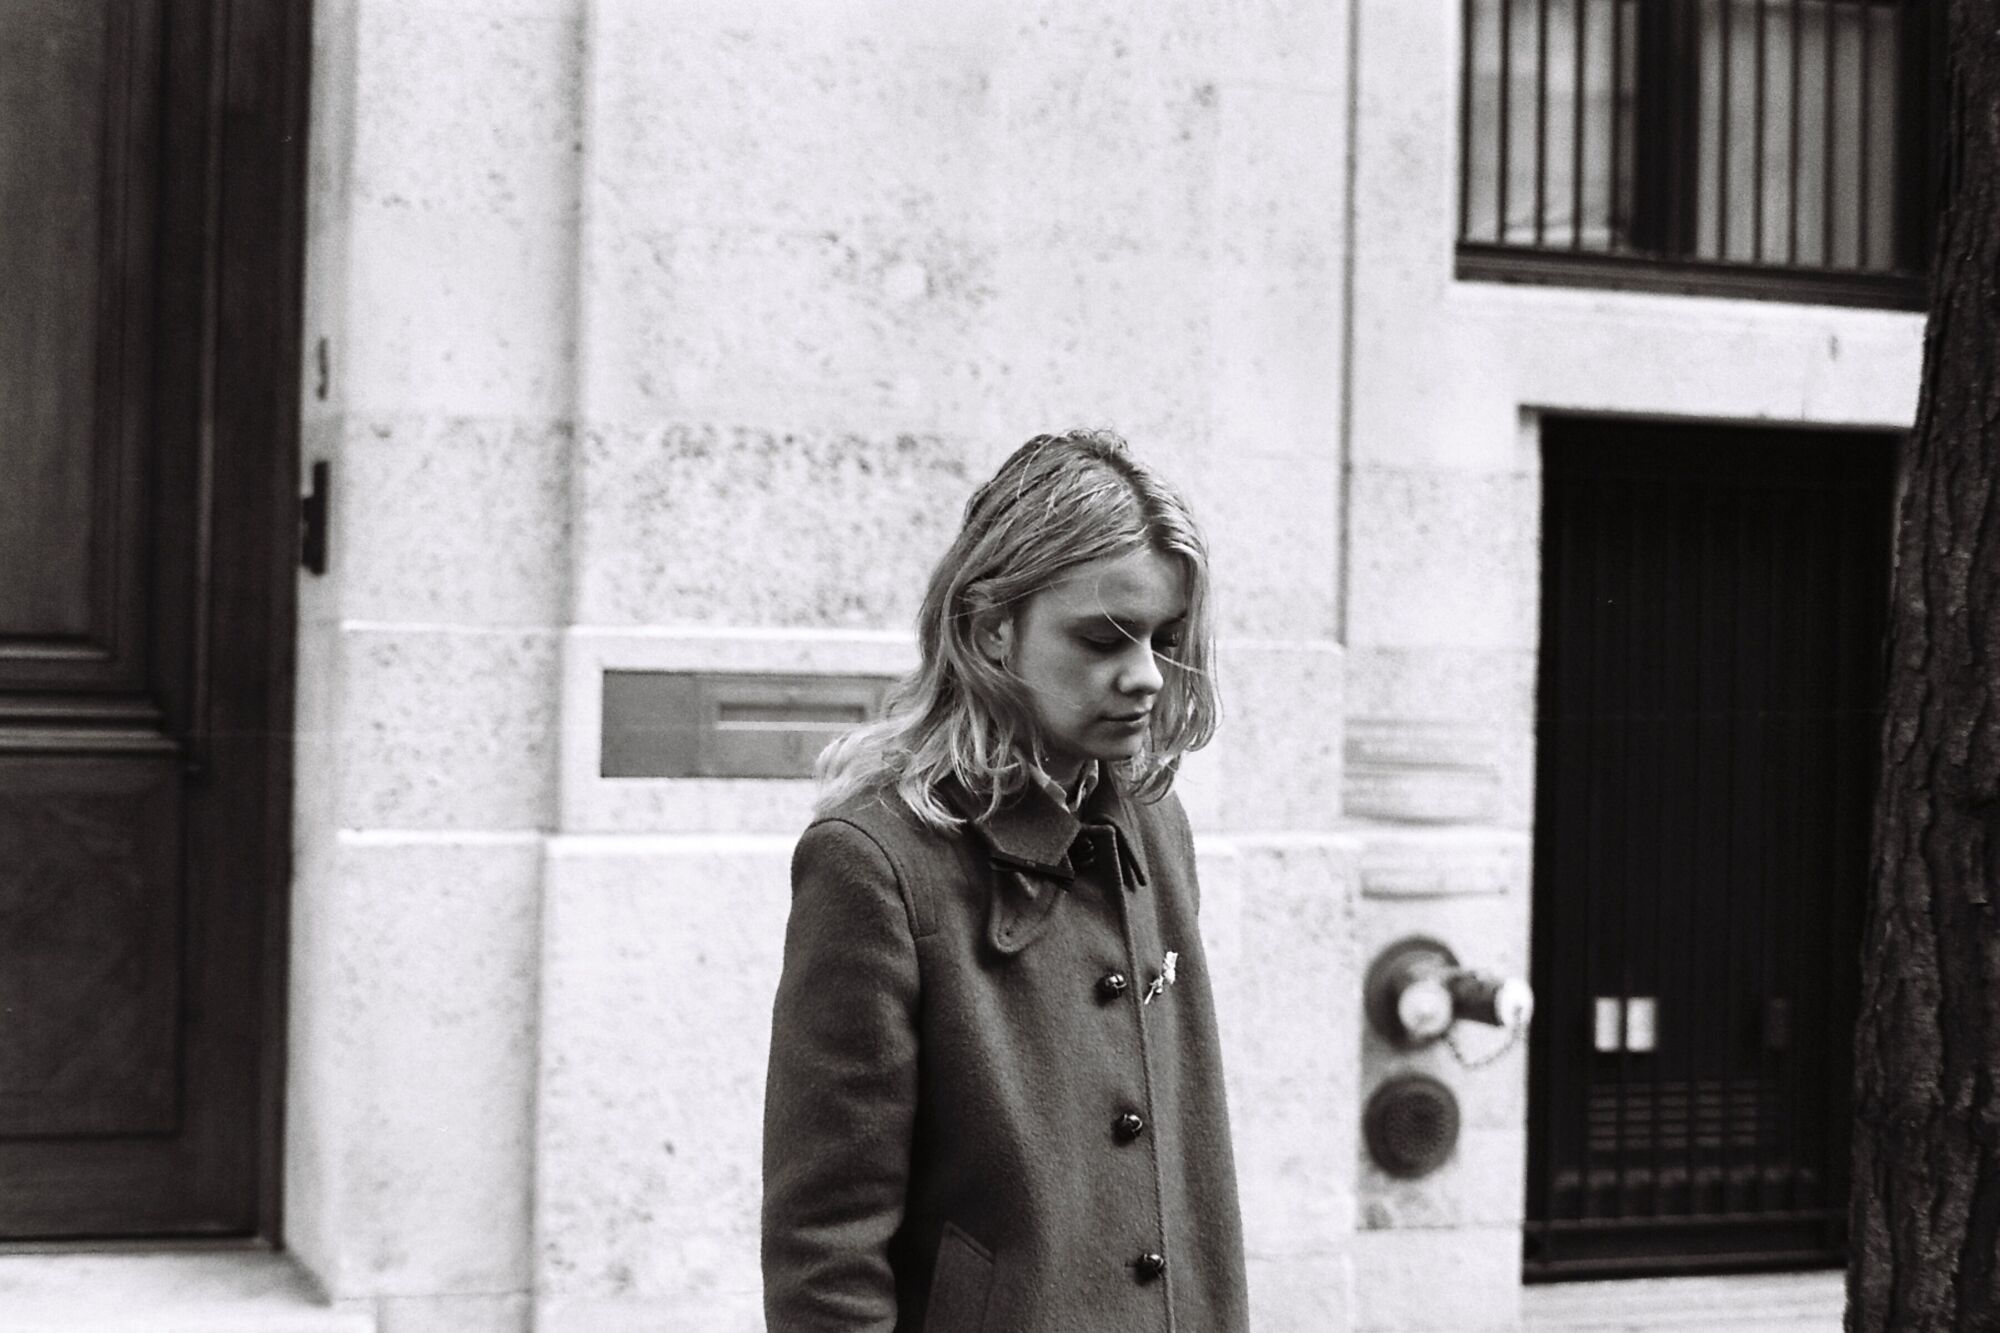 Dasha Nekrasova during filming.